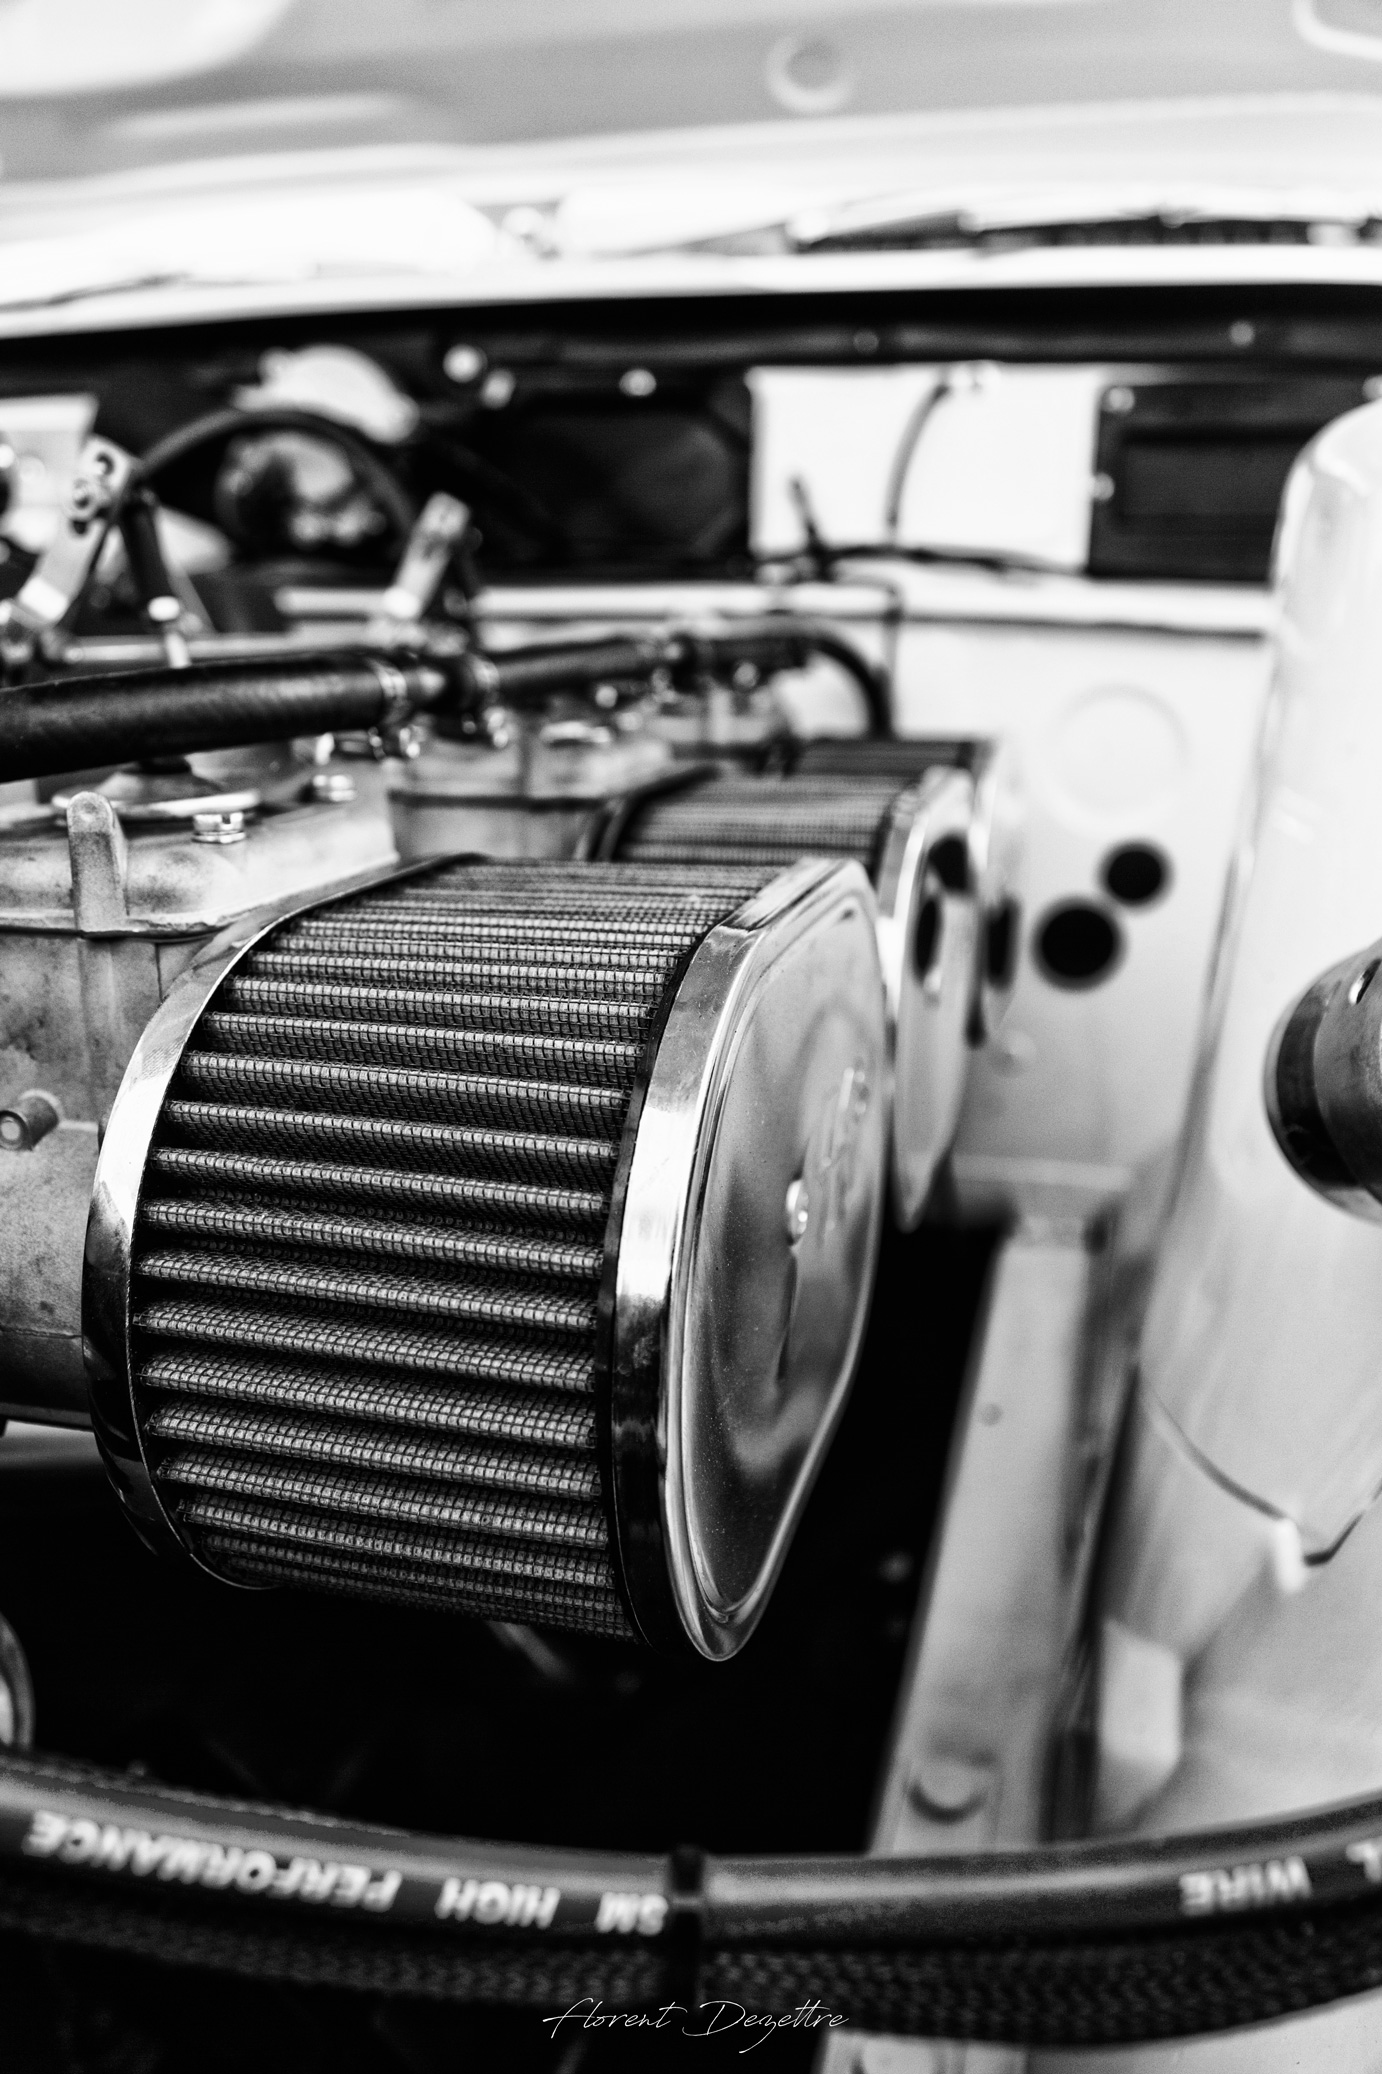 Engine-Close-Up